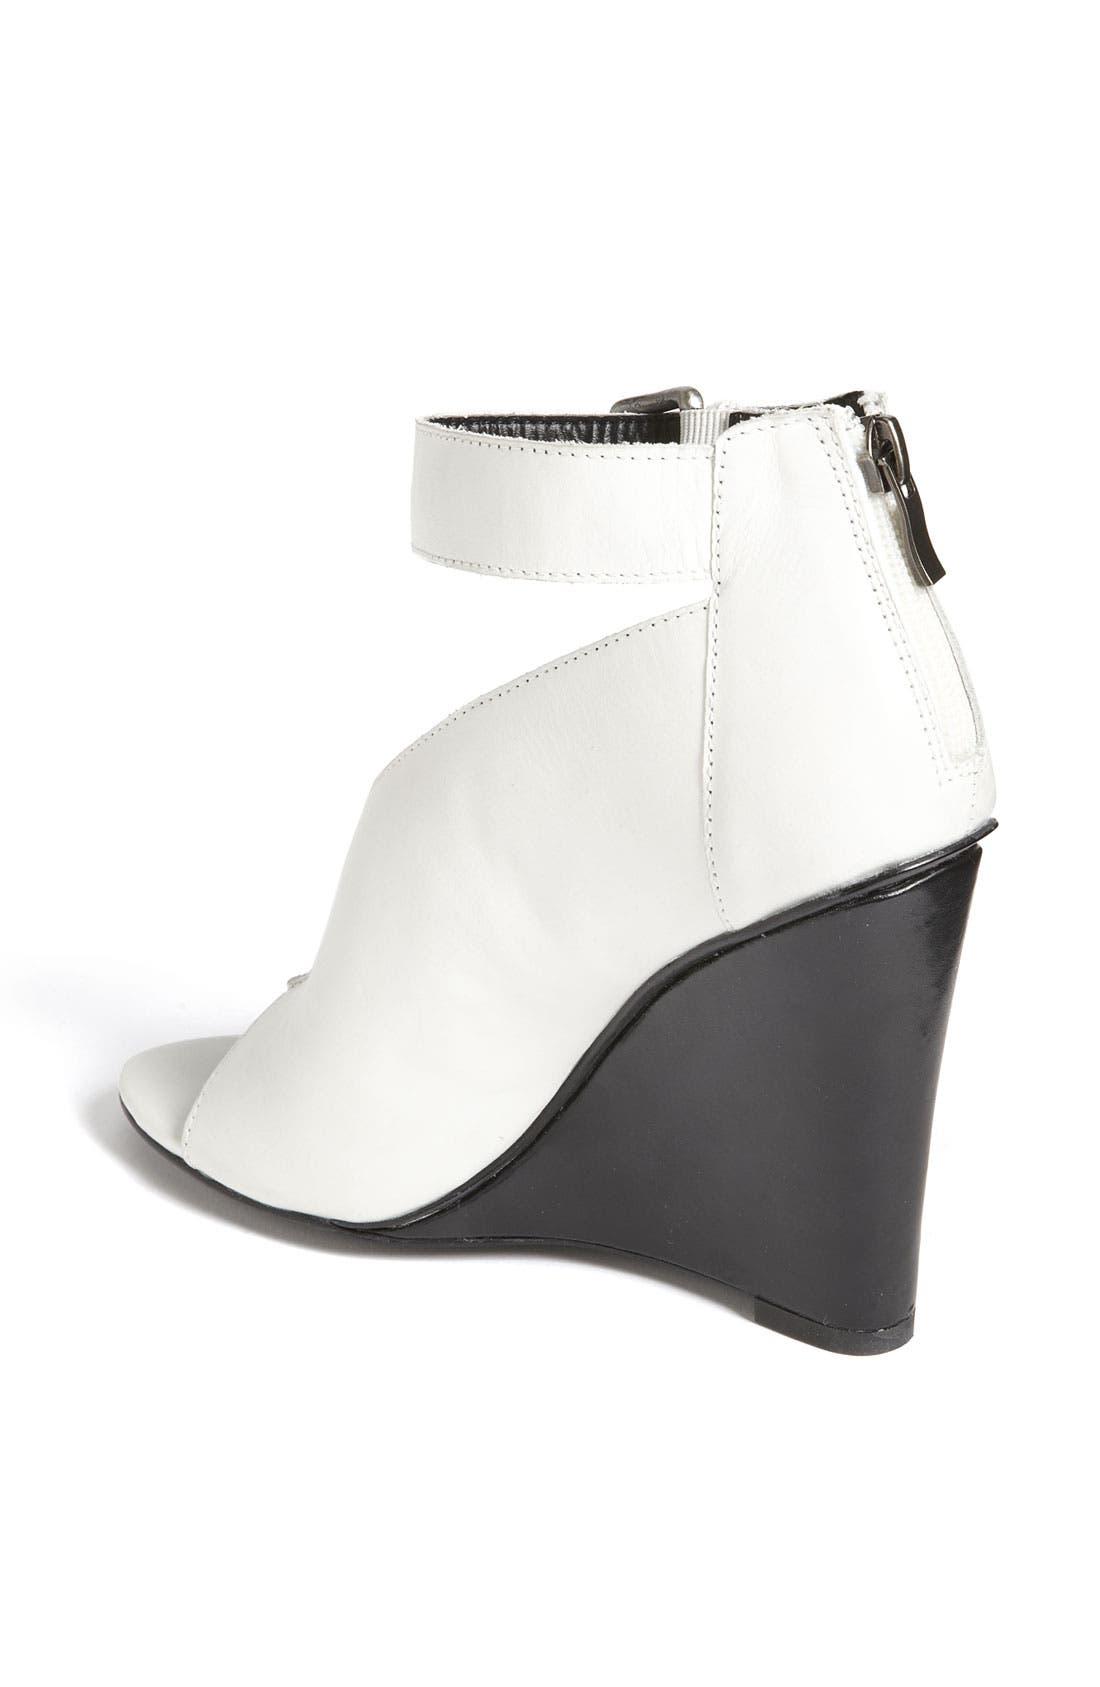 Alternate Image 2  - Trouvé 'Wales' Wedge Sandal